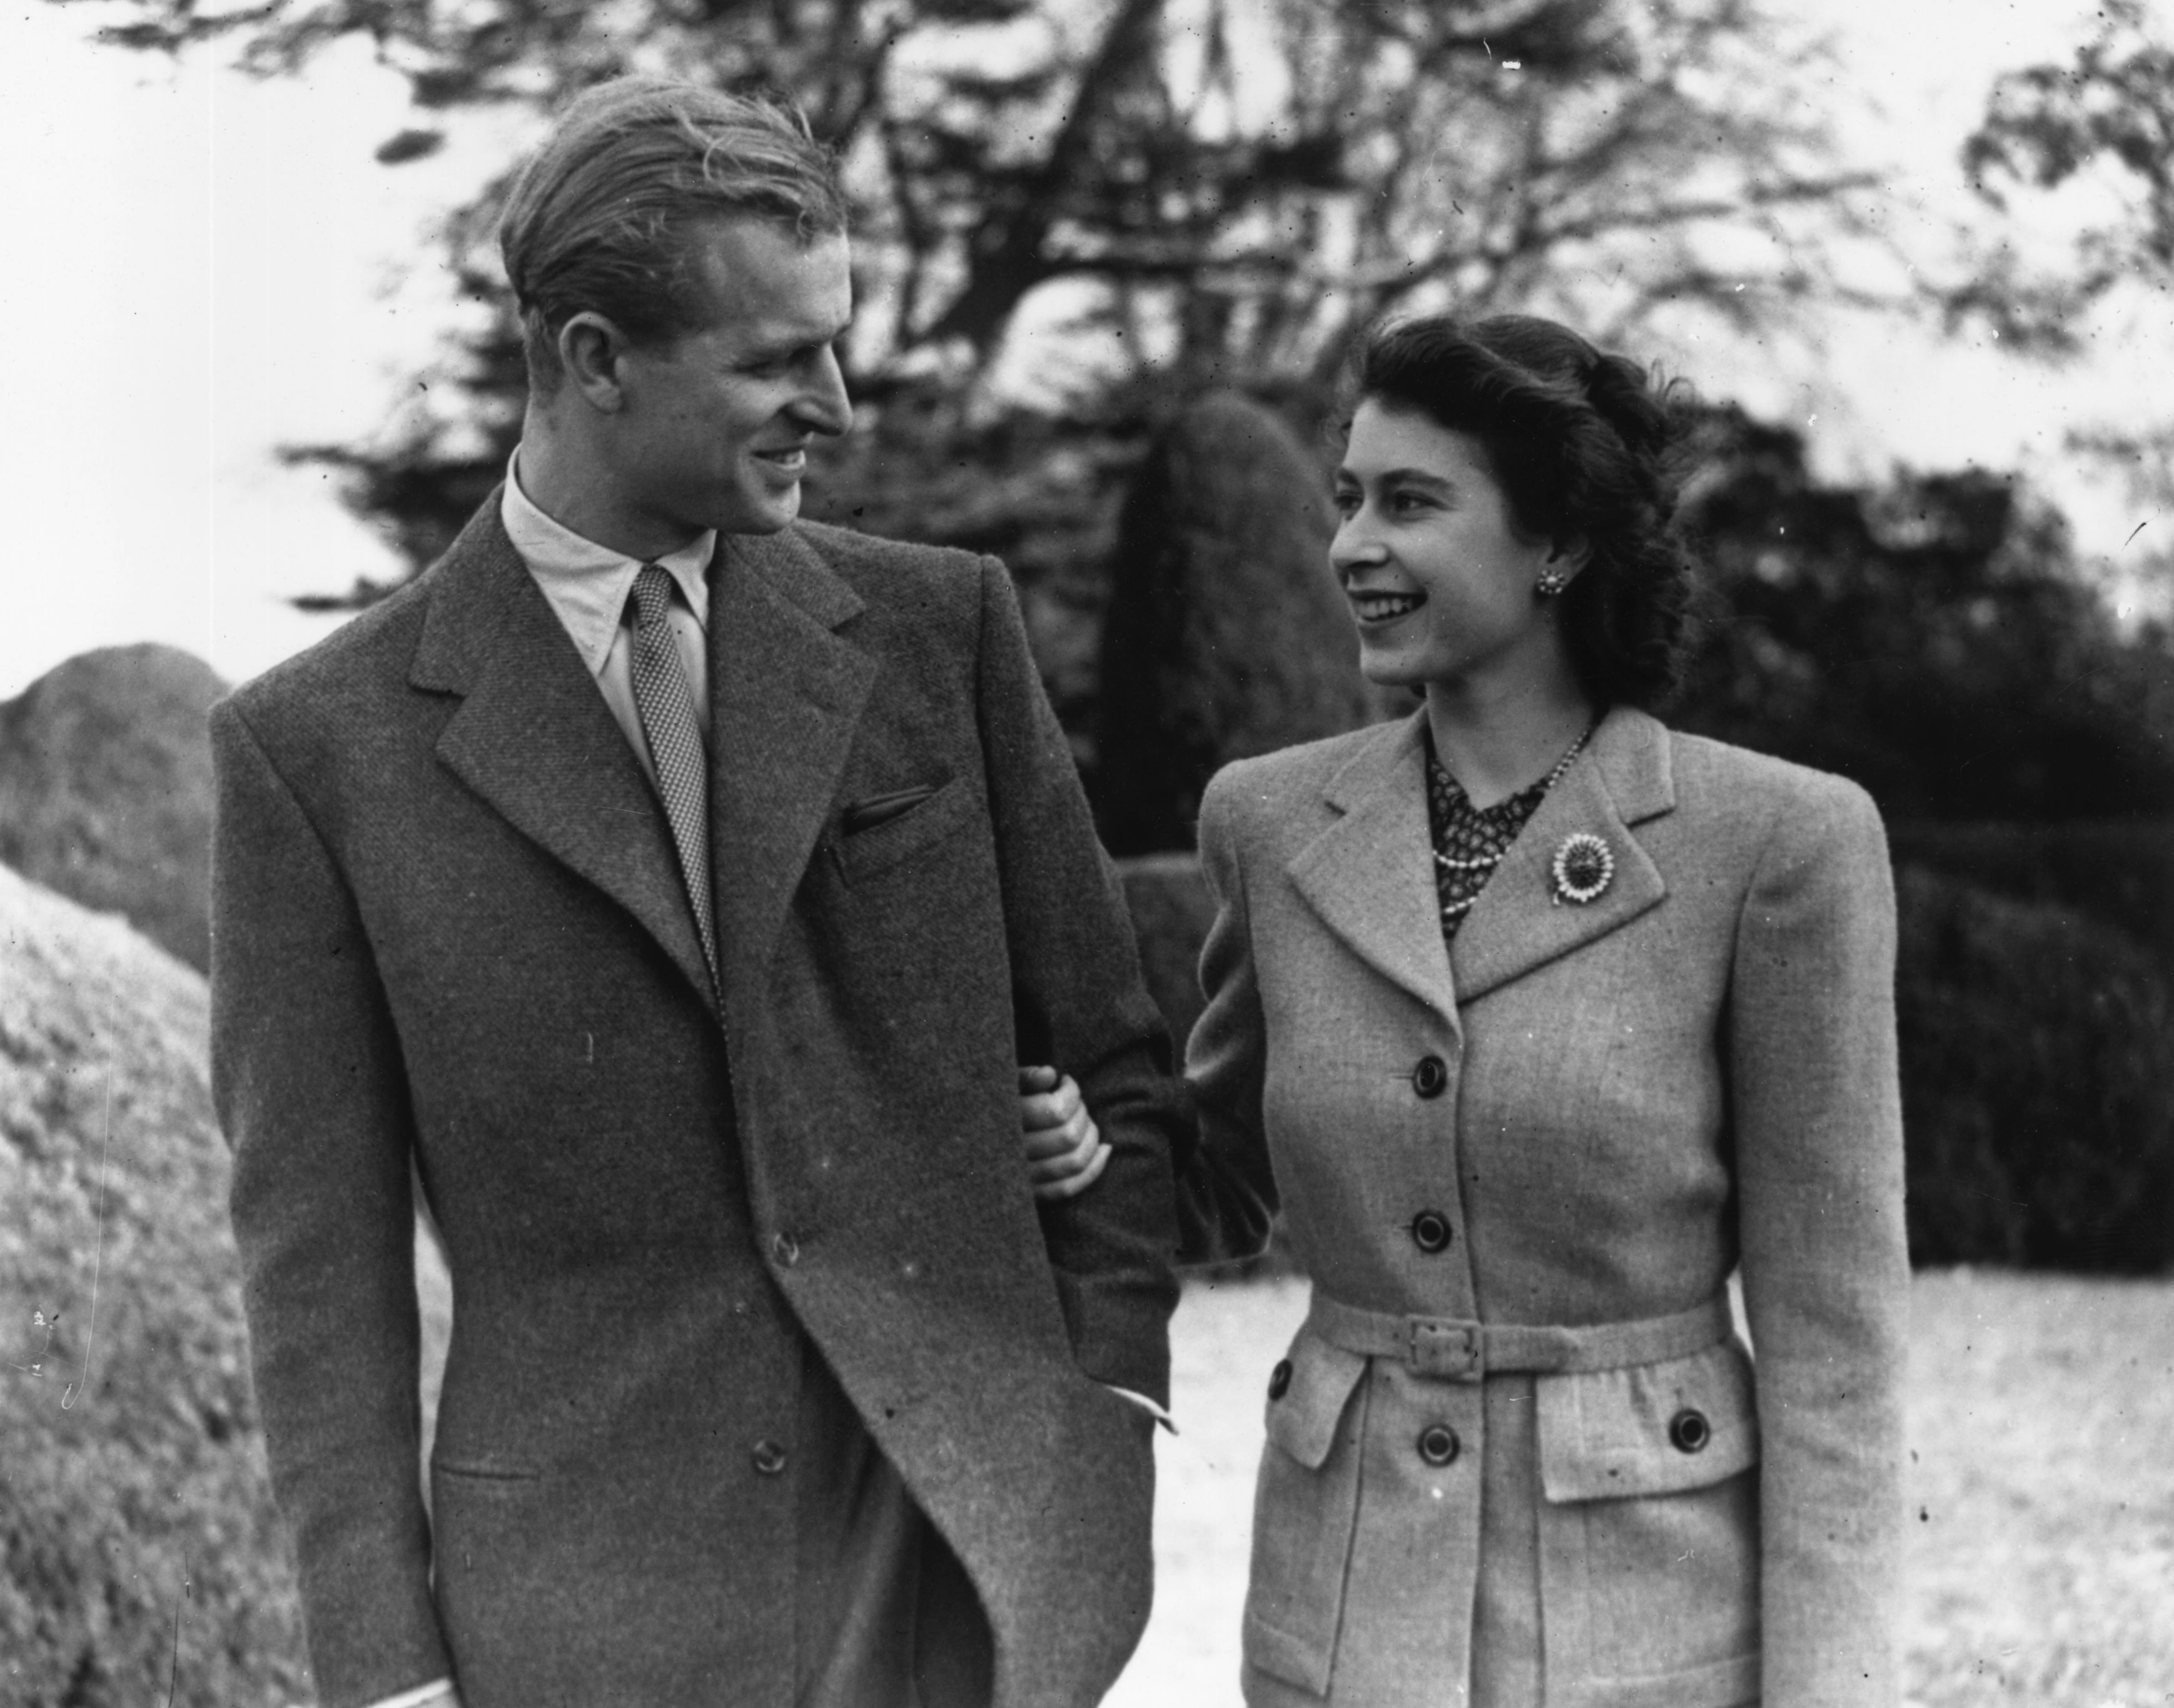 Princess Elizabeth and Philip Mountbatten, Duke of Edinburgh, walk during their honeymoon at Broadlands, Romsey, Hampshire, Nov. 24, 1947.